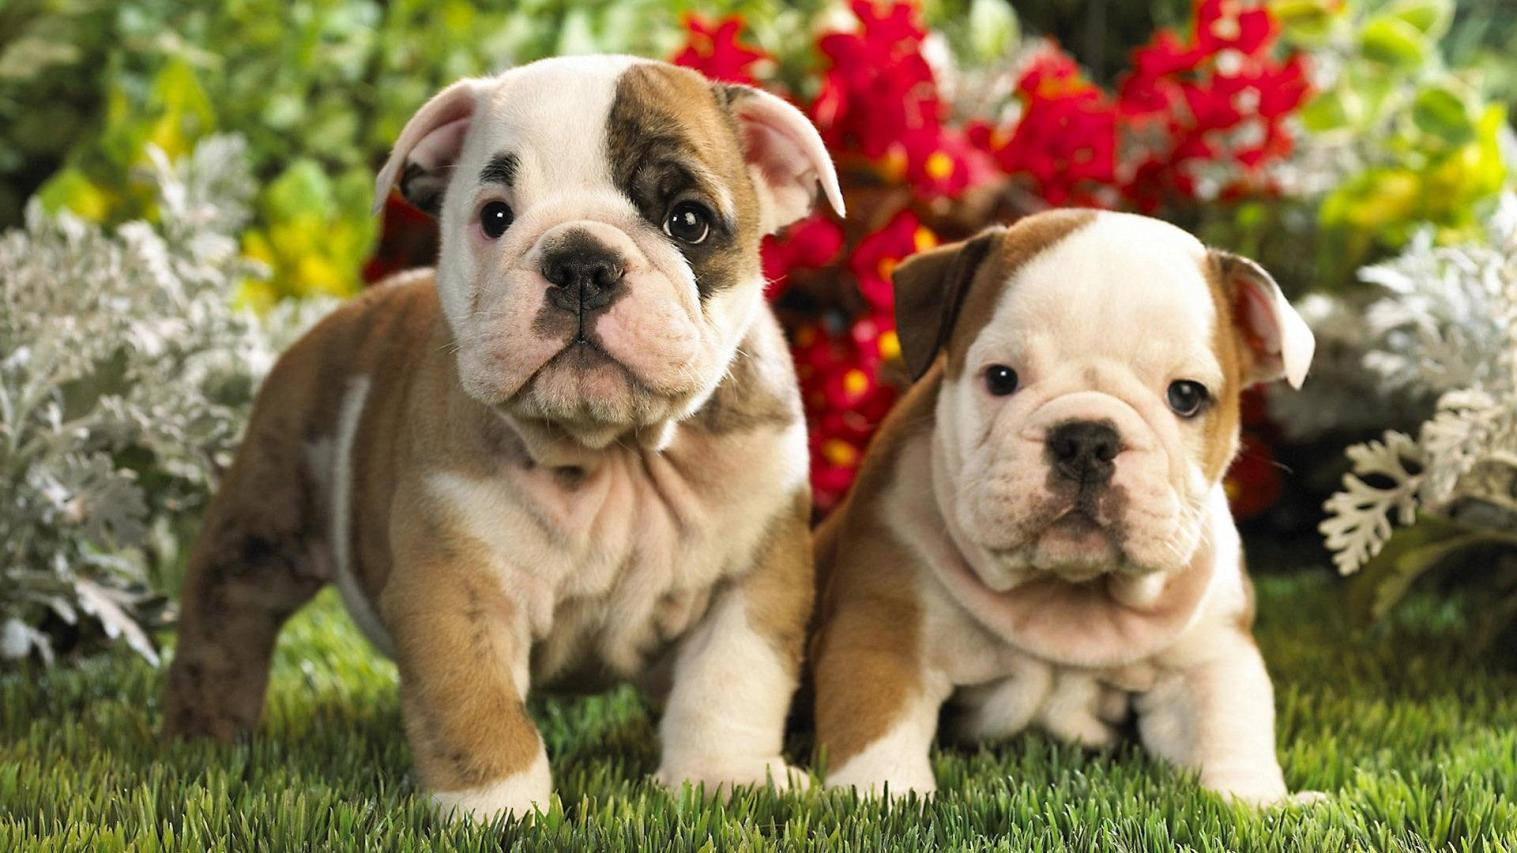 cute puppies wallpaper   8512   The Wondrous Pics 1517x853